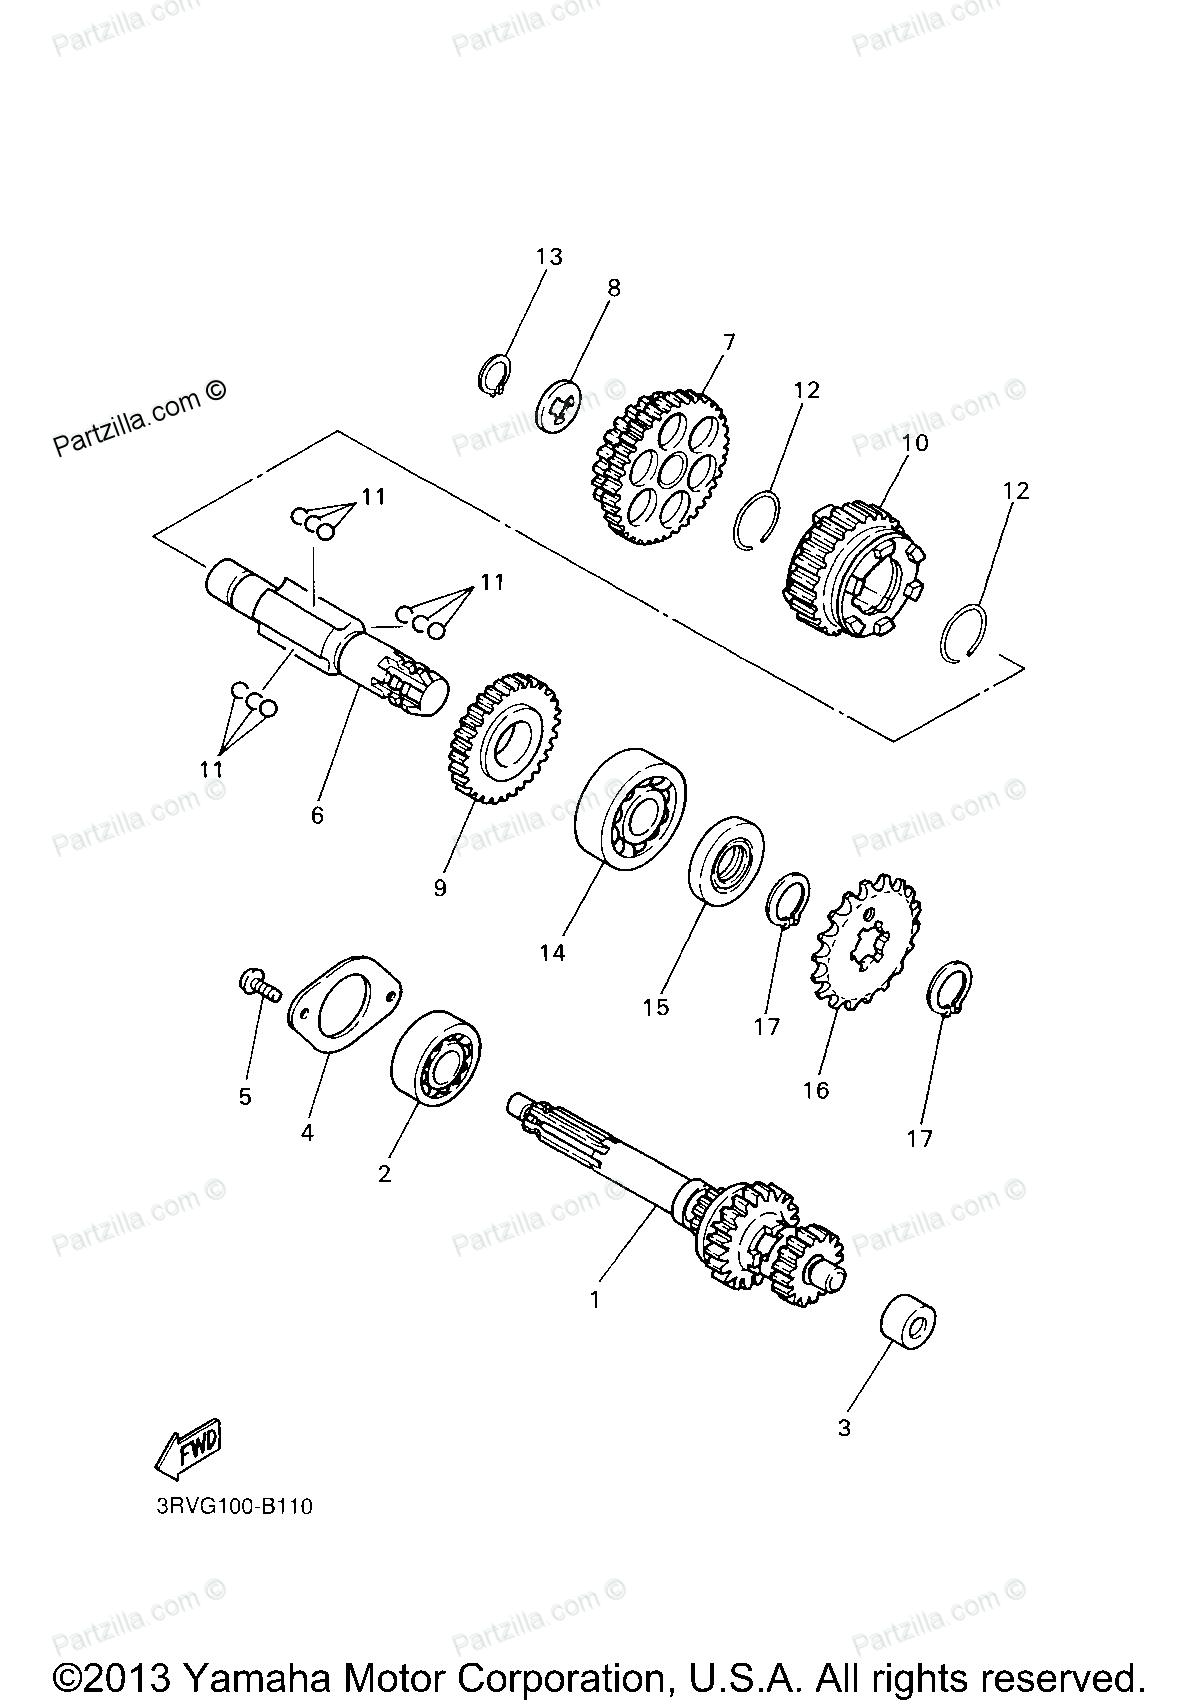 Pw80 High Performance Transmission